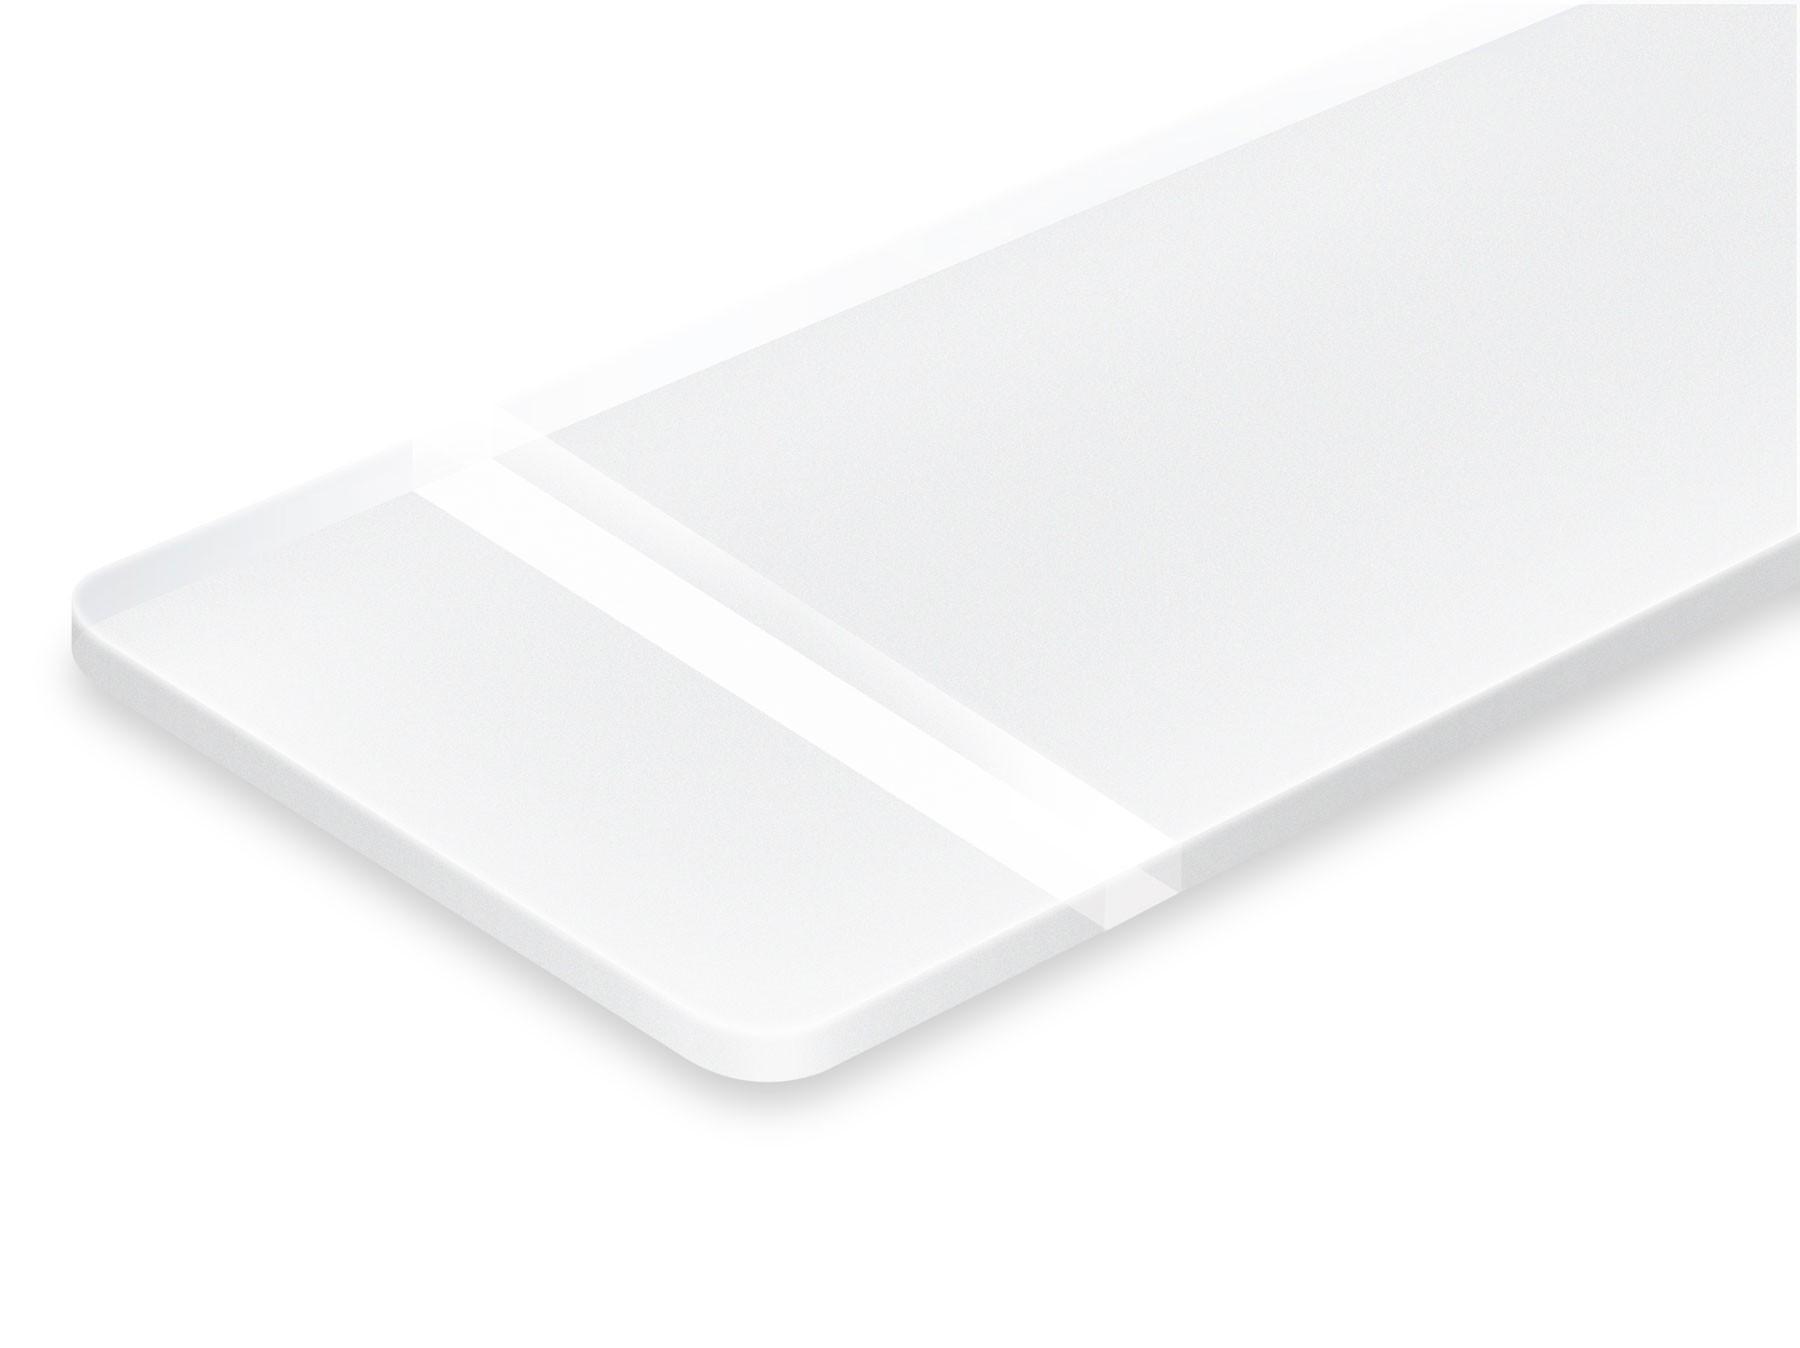 PUR201-209 Matte/White 3,2mm